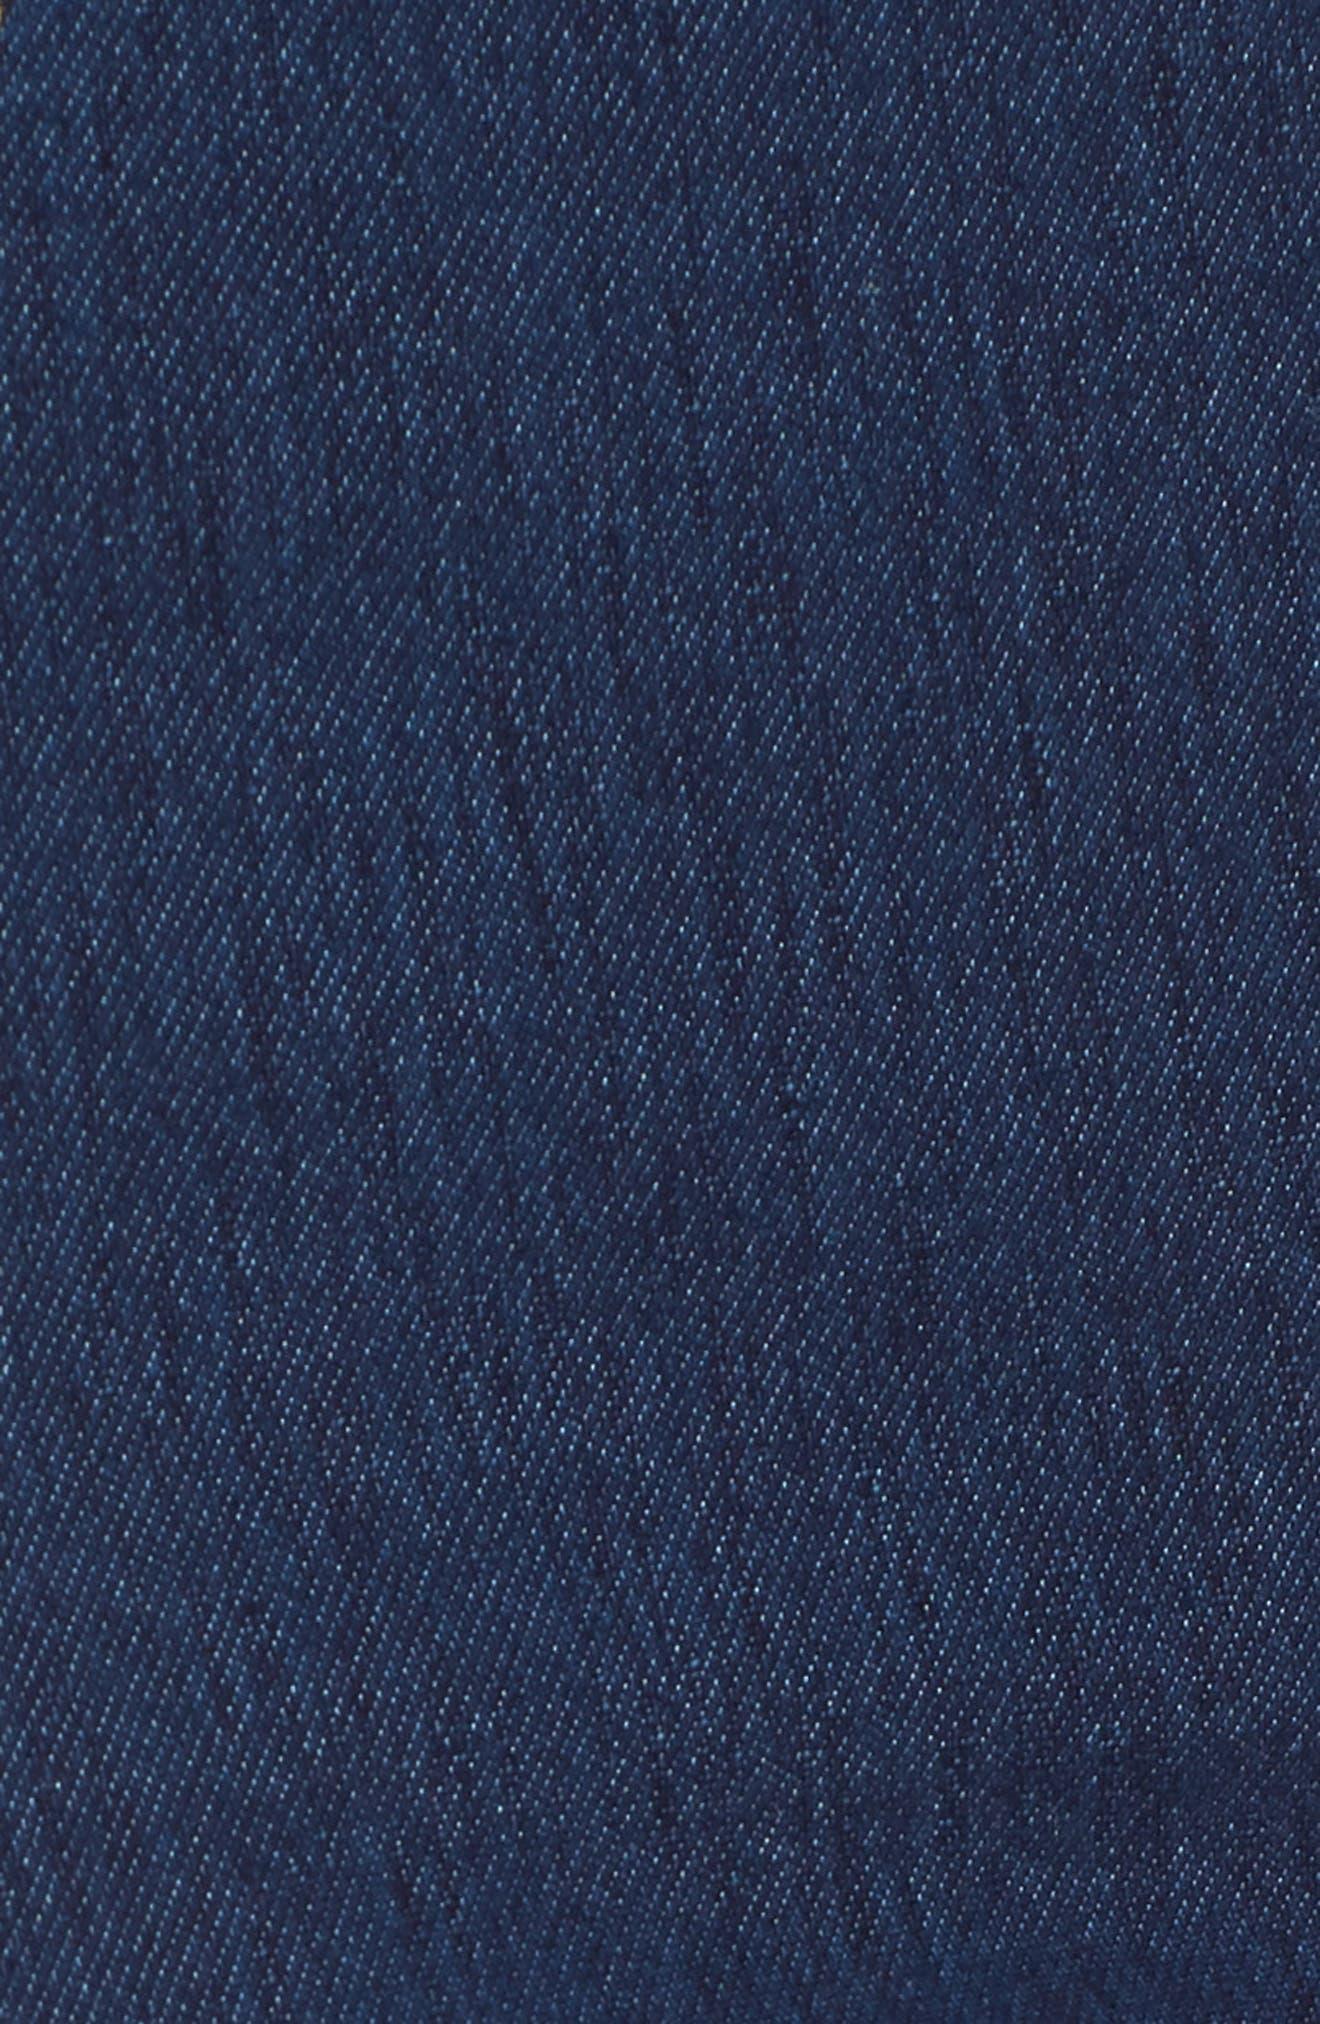 Basic High Waist Denim Leggings,                             Alternate thumbnail 5, color,                             Navy Indigo Dark Wash